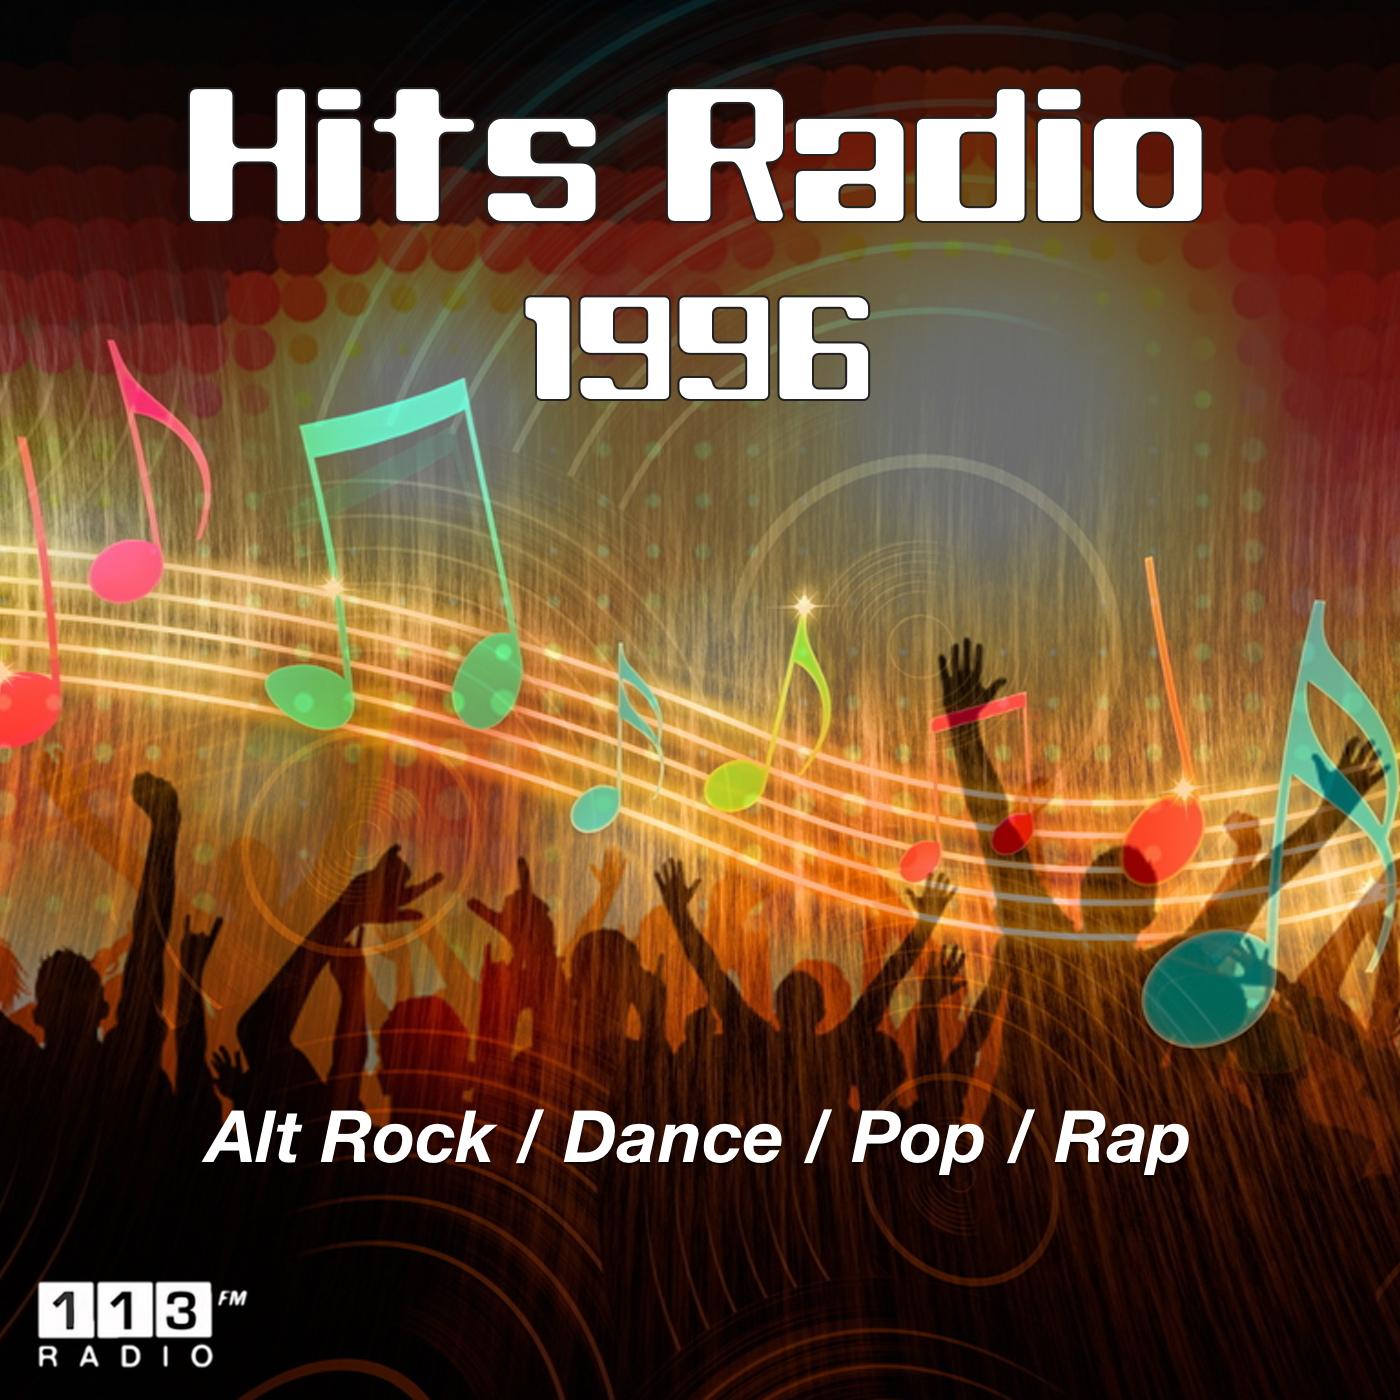 113.fm Hits Radio - 1996